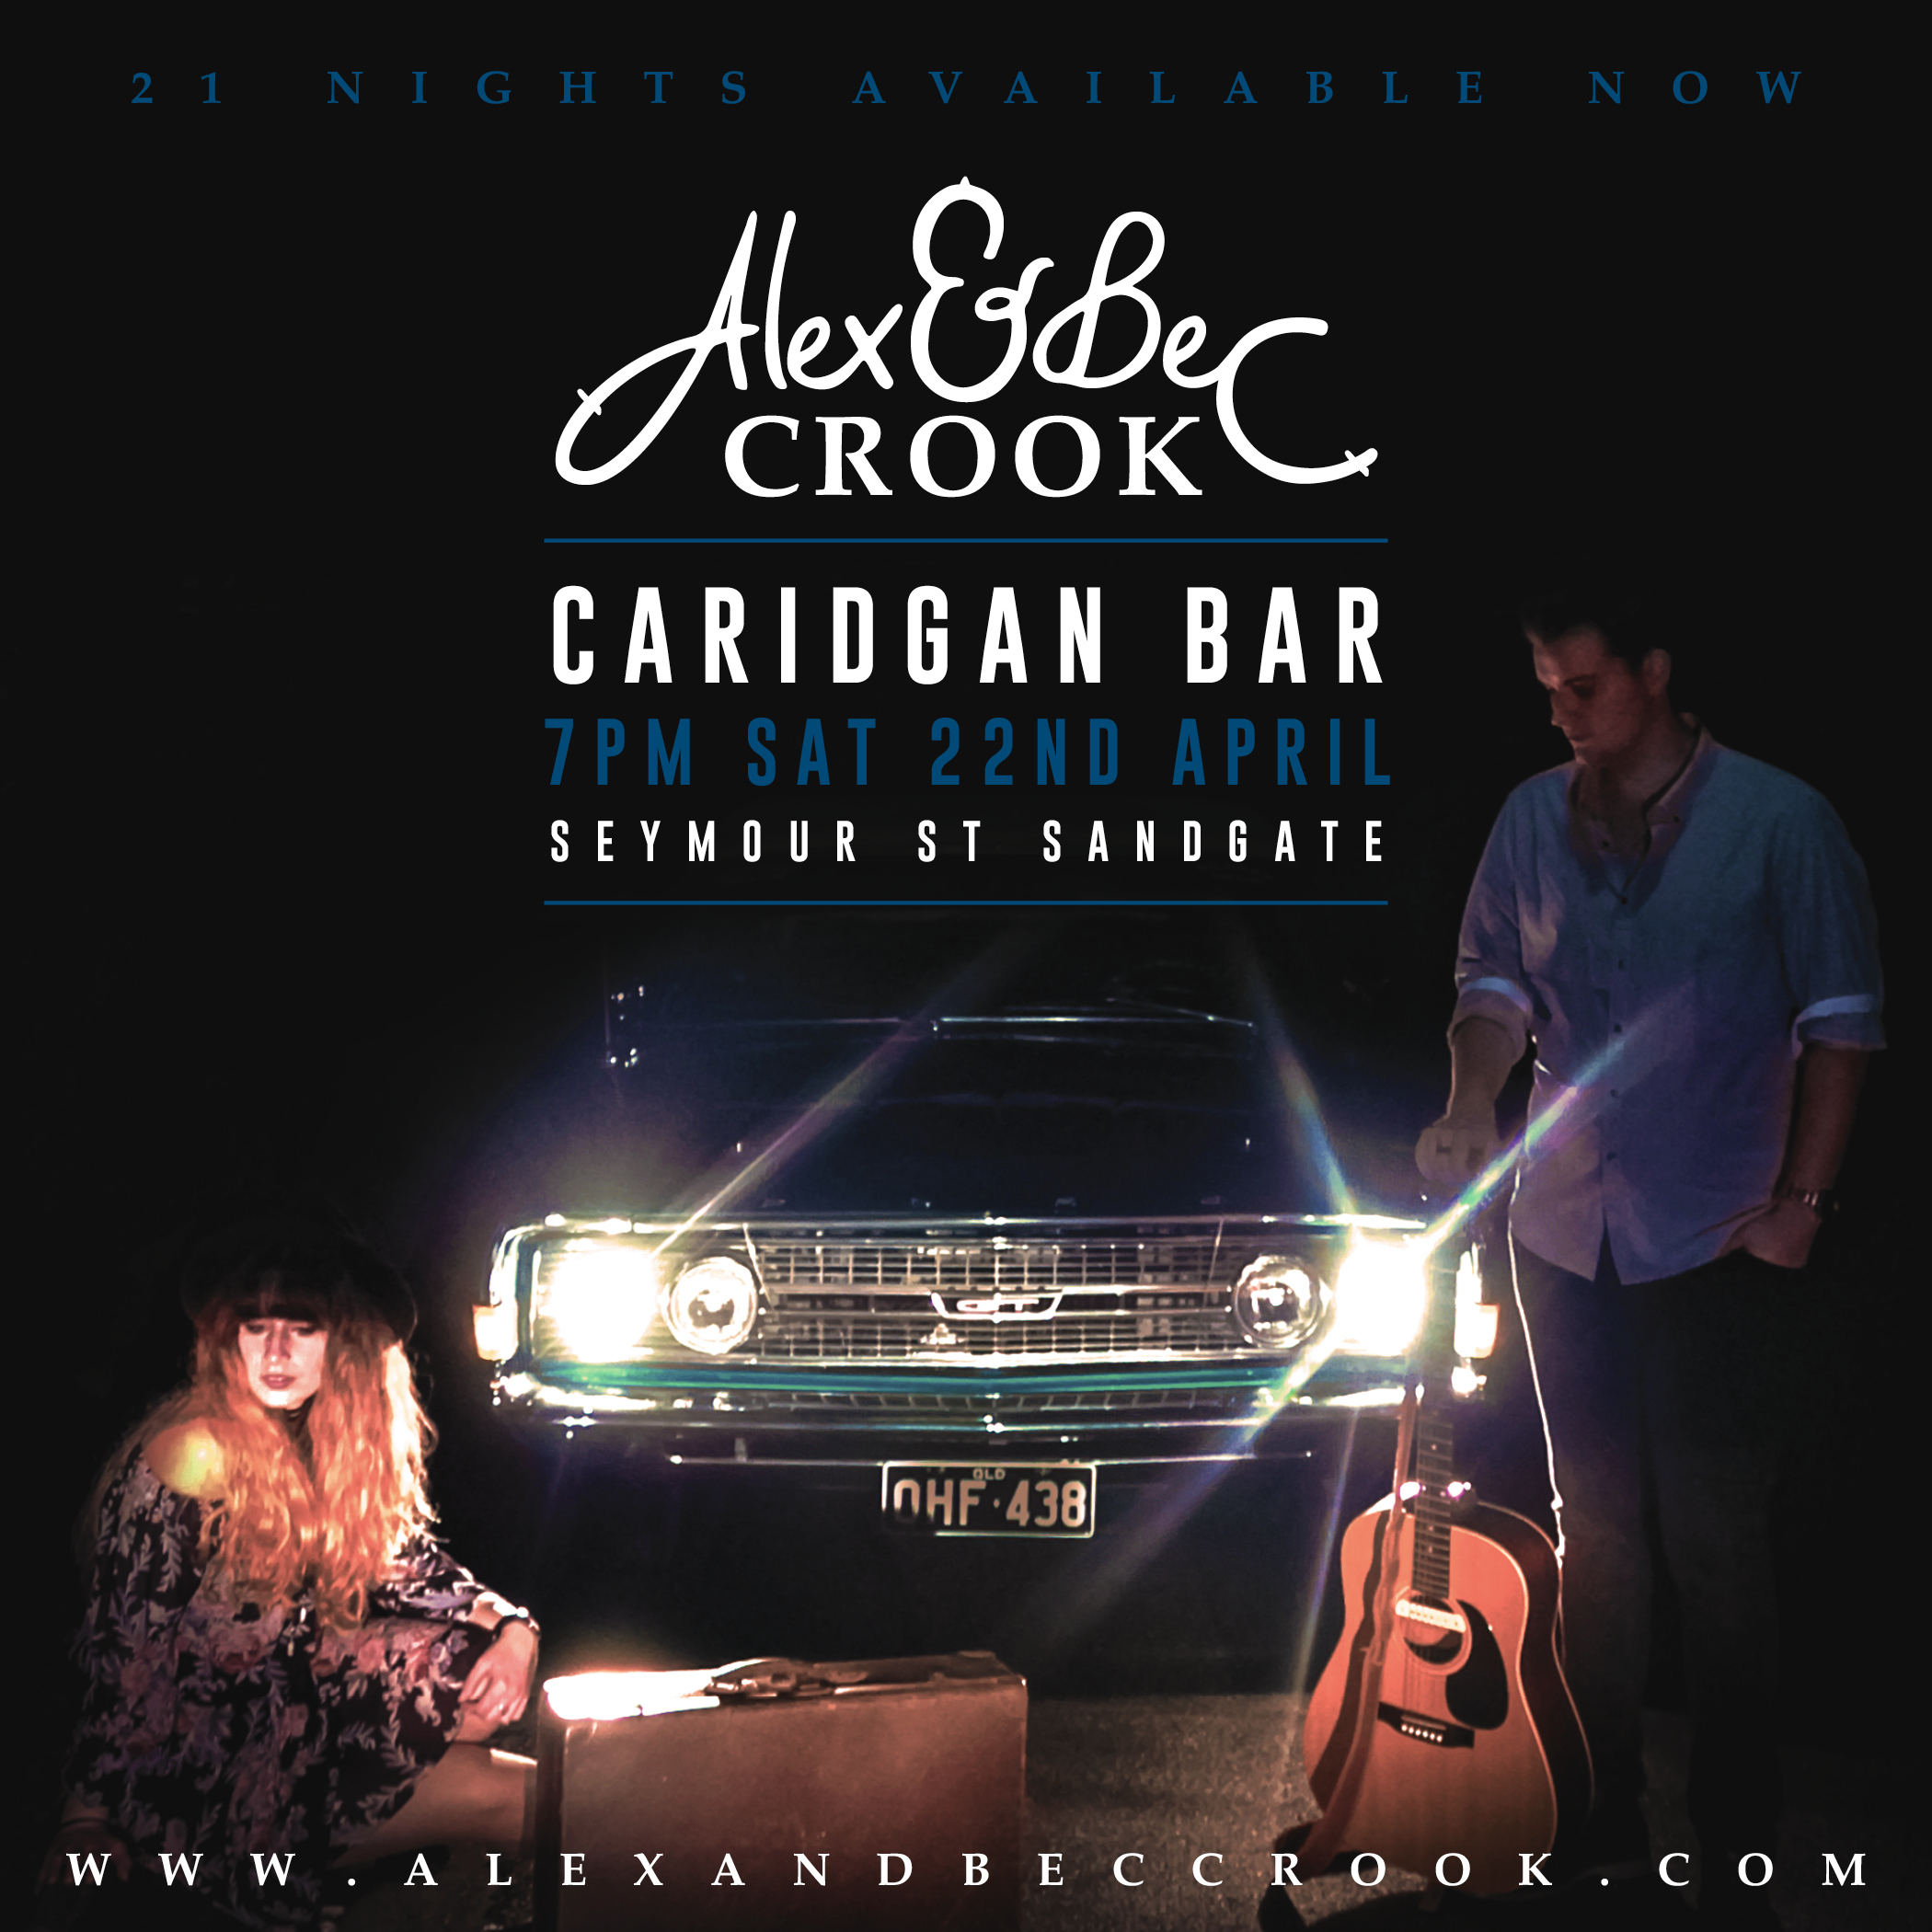 Alex&BecCrook - Cardigan Bar 22nd April.jpg